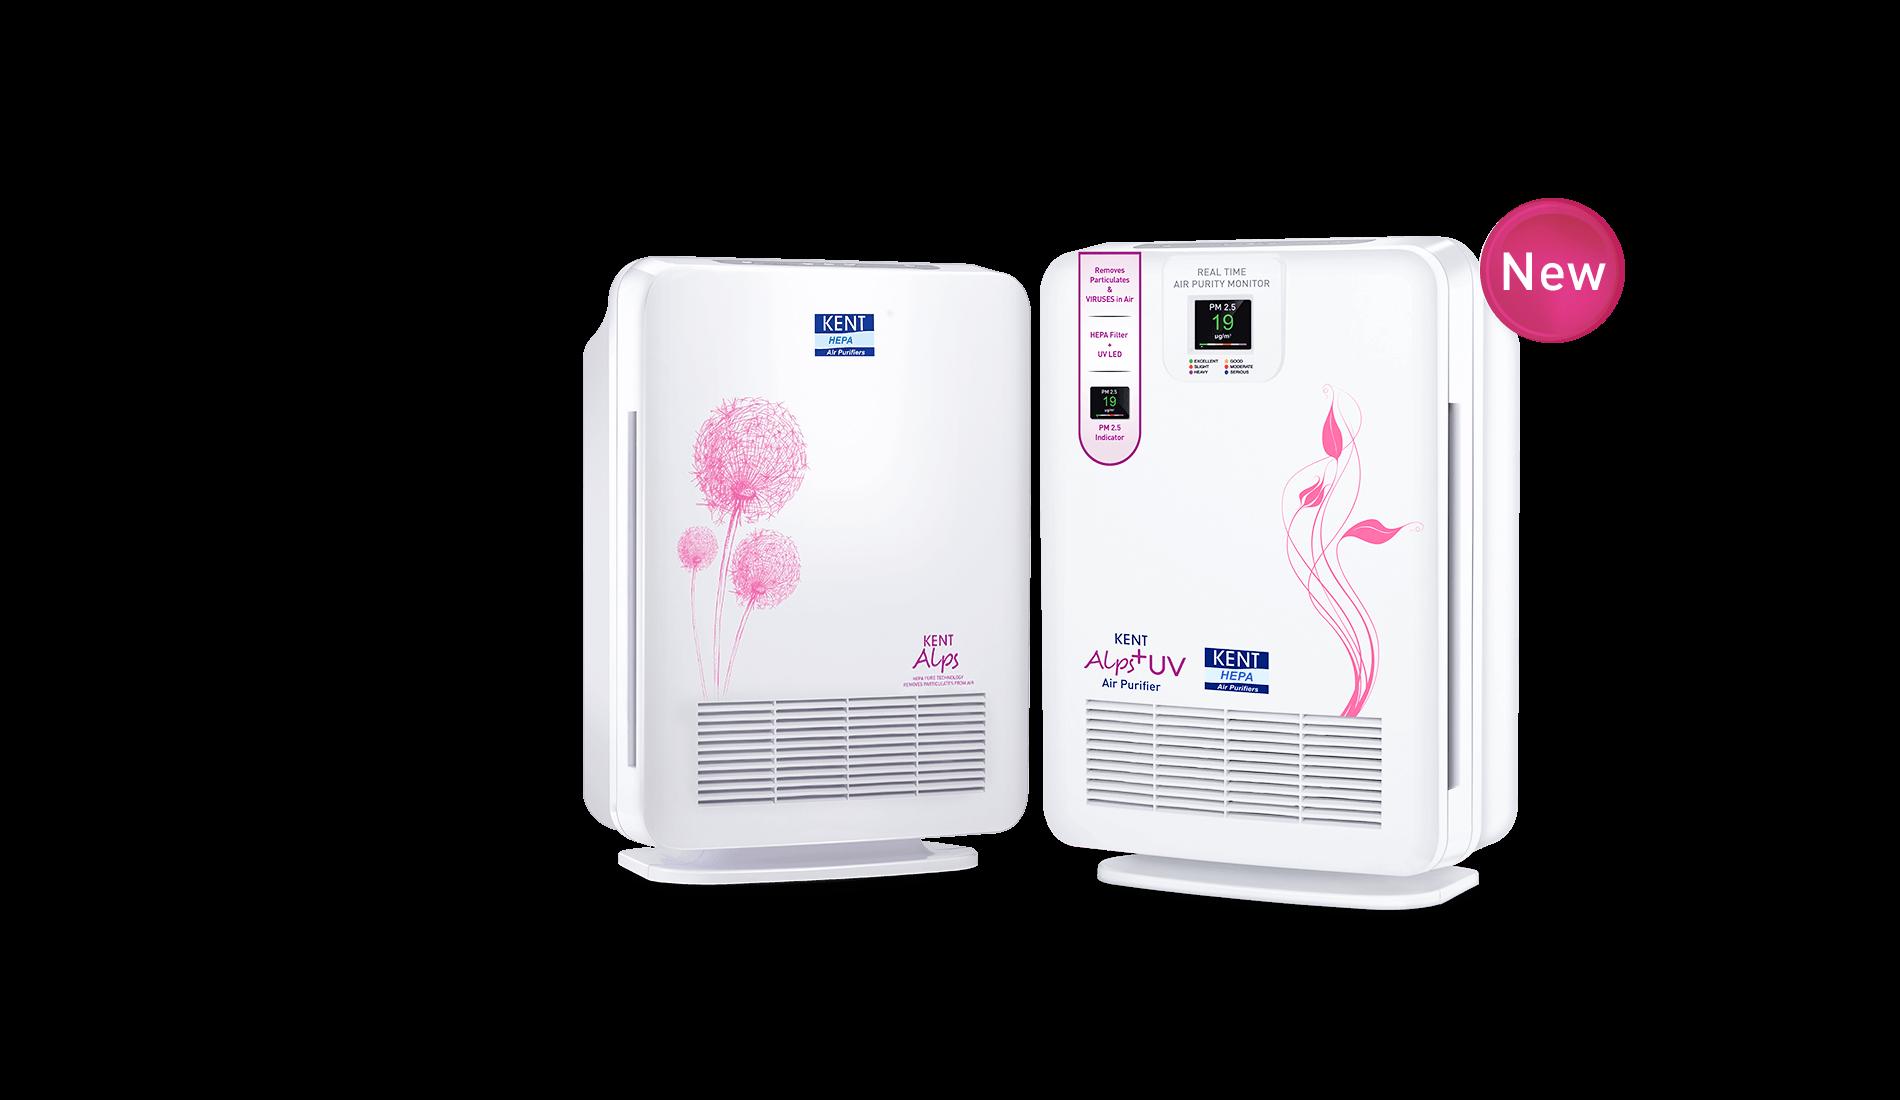 KENT Air Purifiers